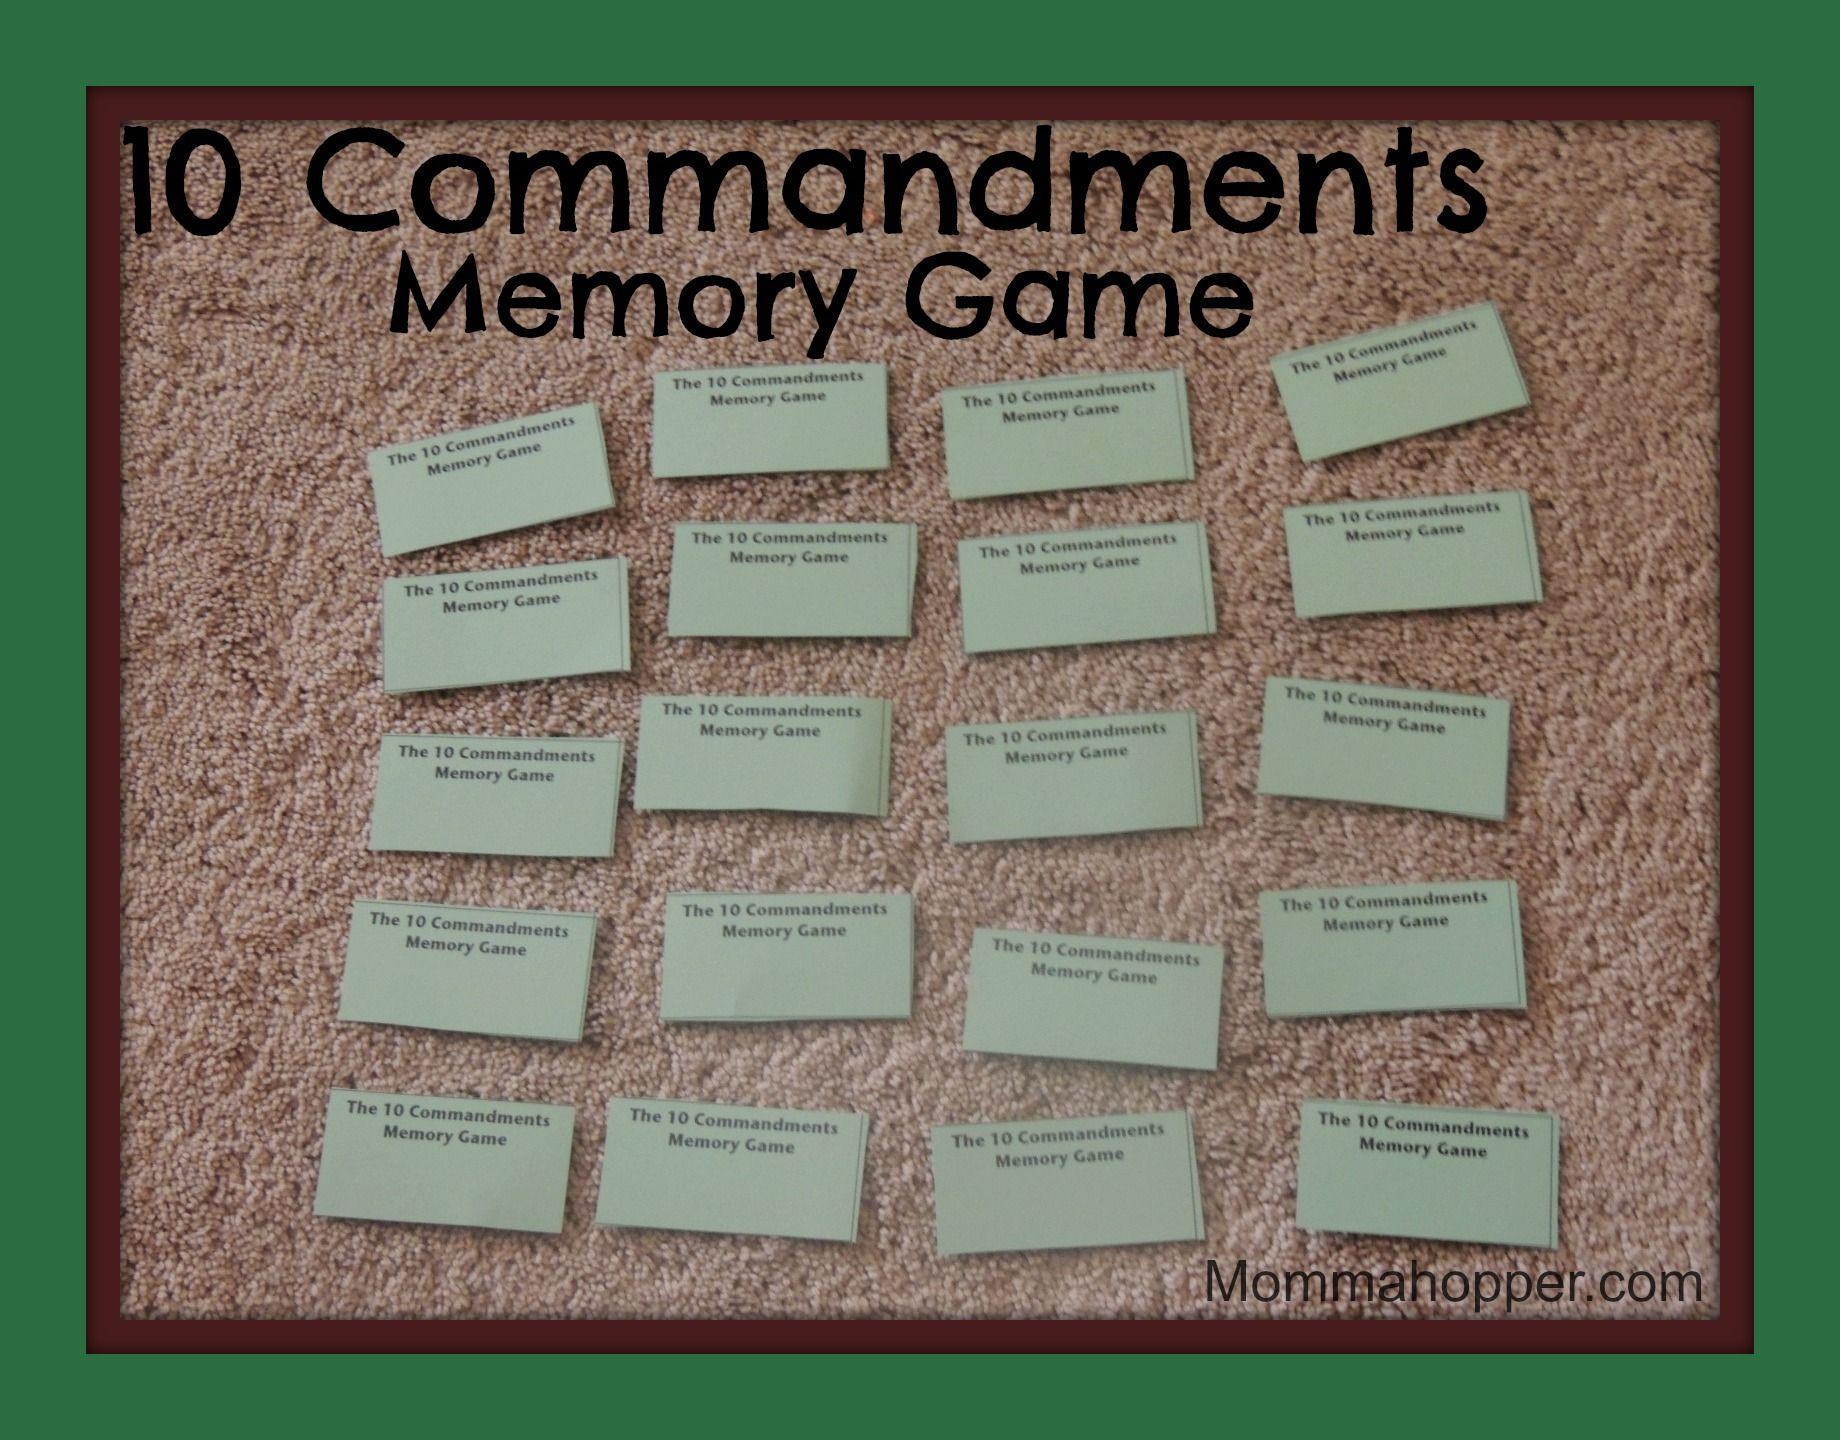 10 Commandments Memory Game